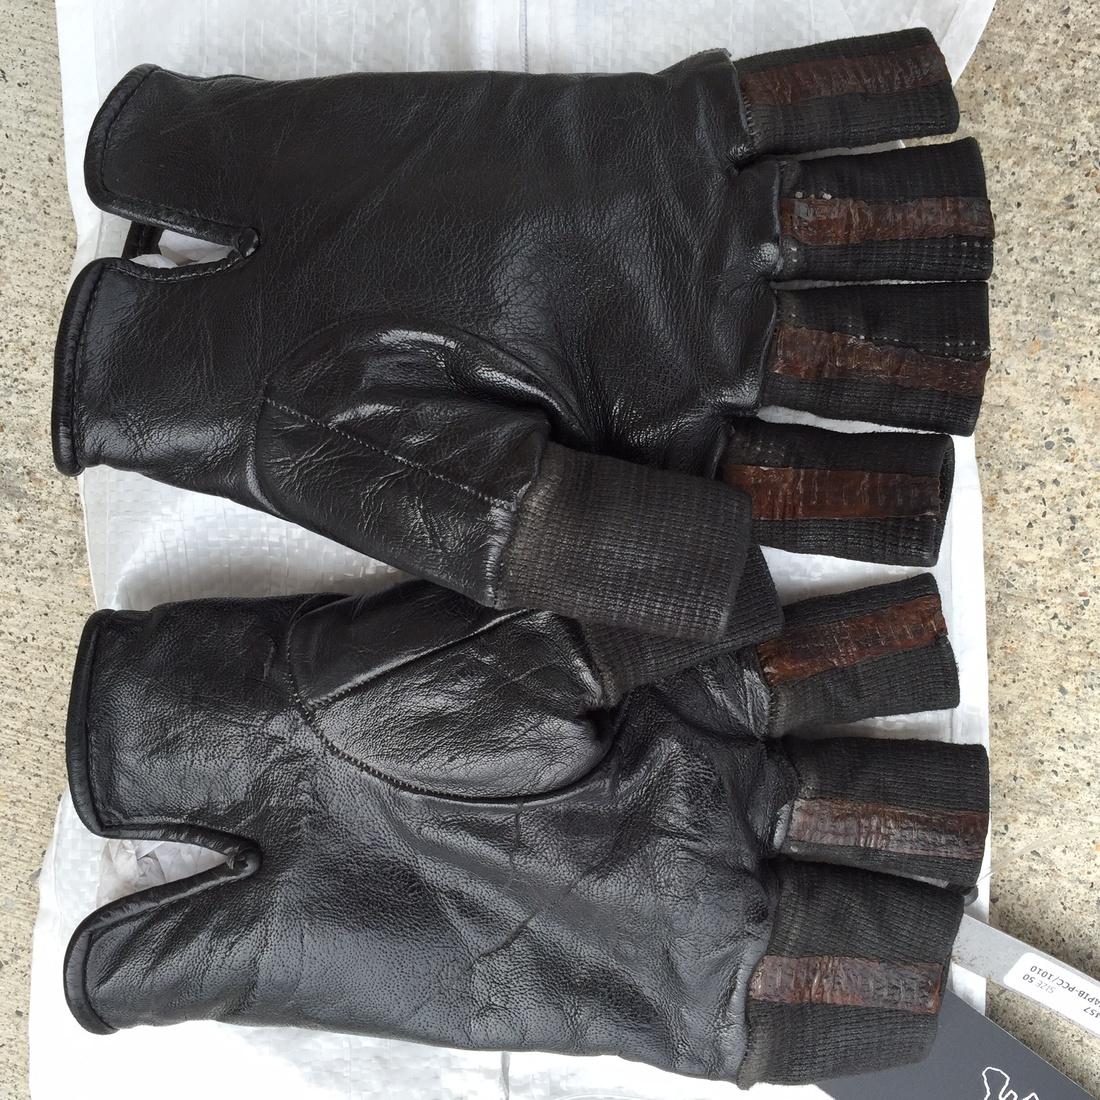 Black leather cut off gloves -  Carol Christian Poell Black Leather Cut Off Gloves Size 40 1